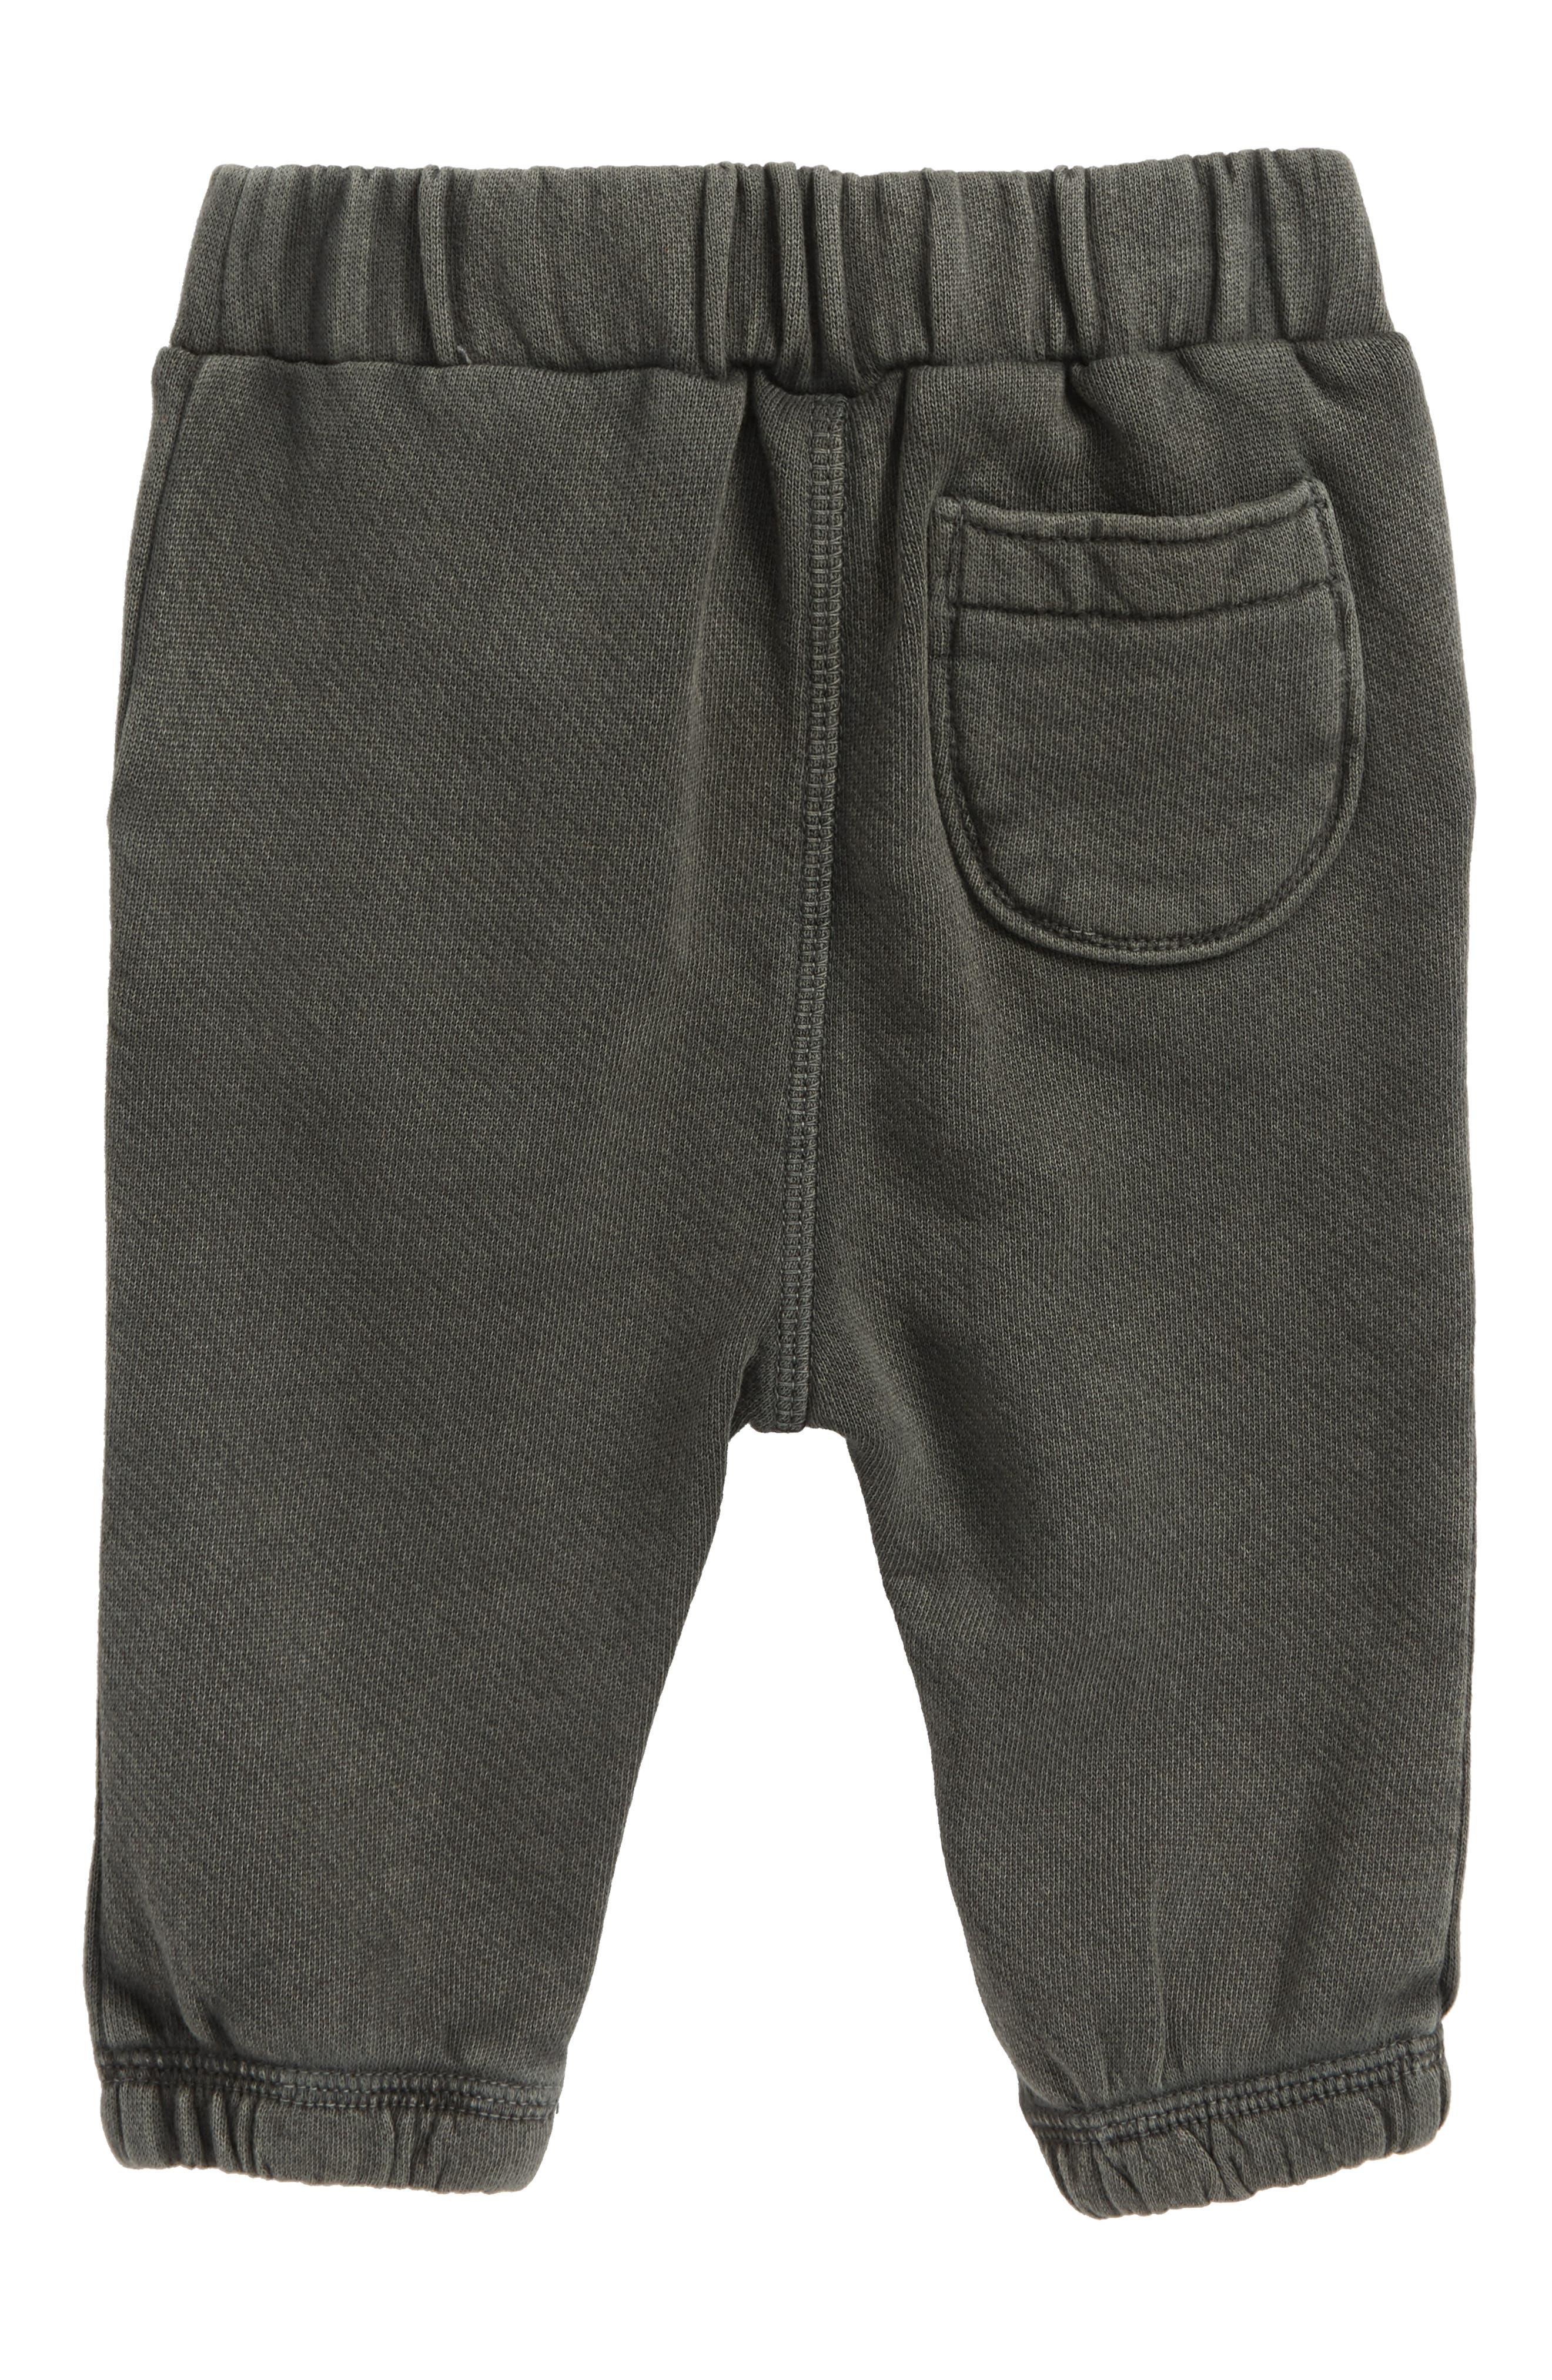 Tucker & Tate Washed Jogger Pants,                             Alternate thumbnail 2, color,                             Olive Sarma